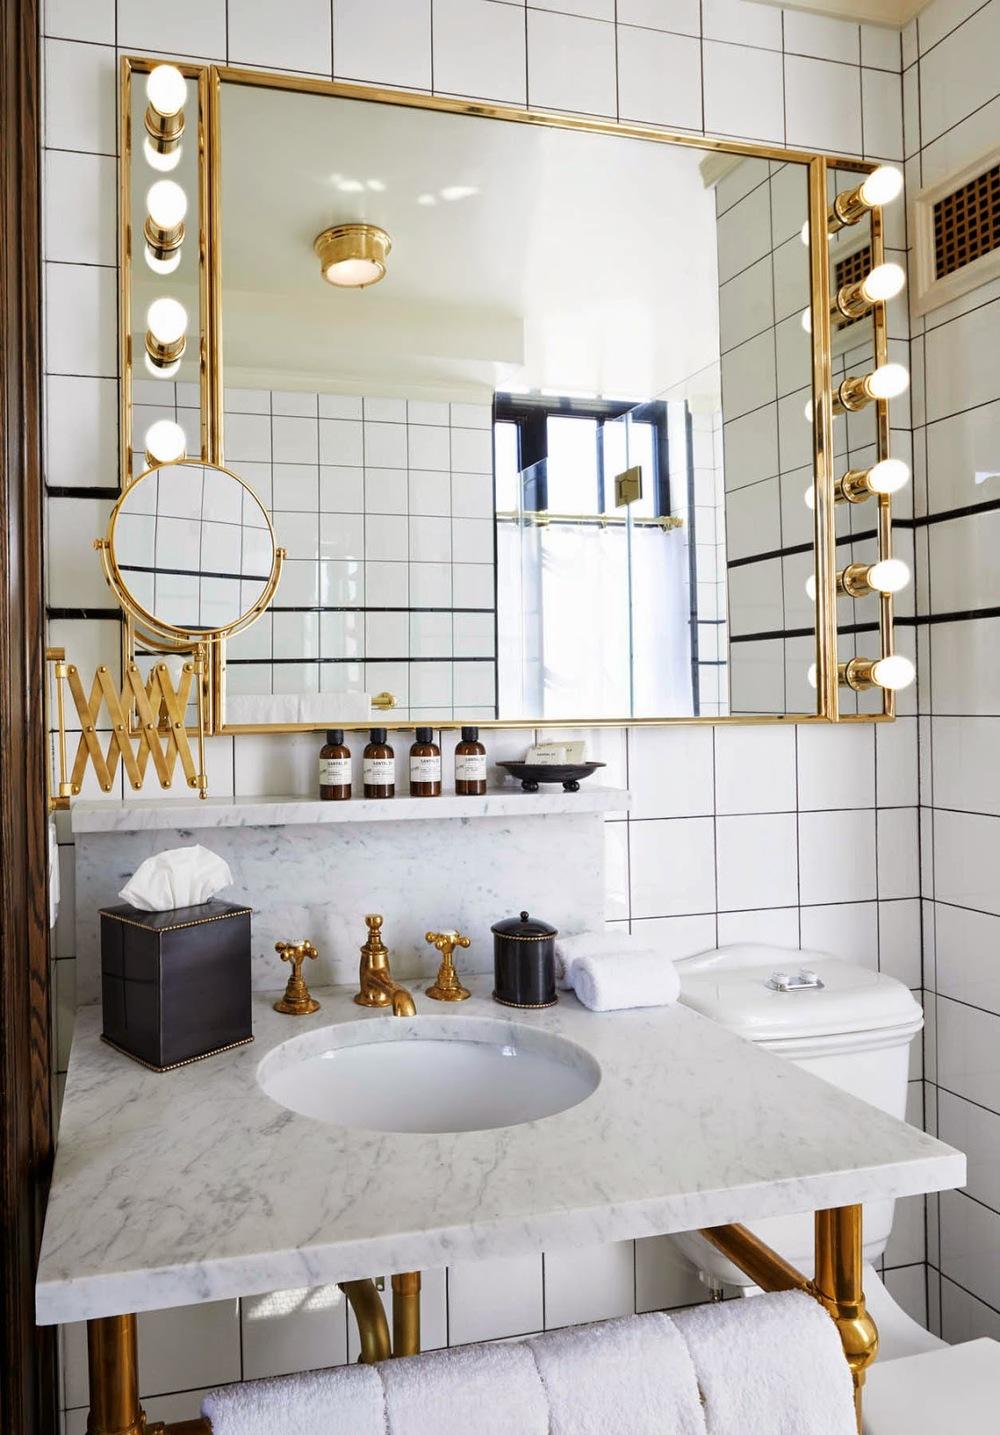 1431_LUDLOW_HOTEL_RM_1411_Bathroom_2_162_1398287320607-1.jpg